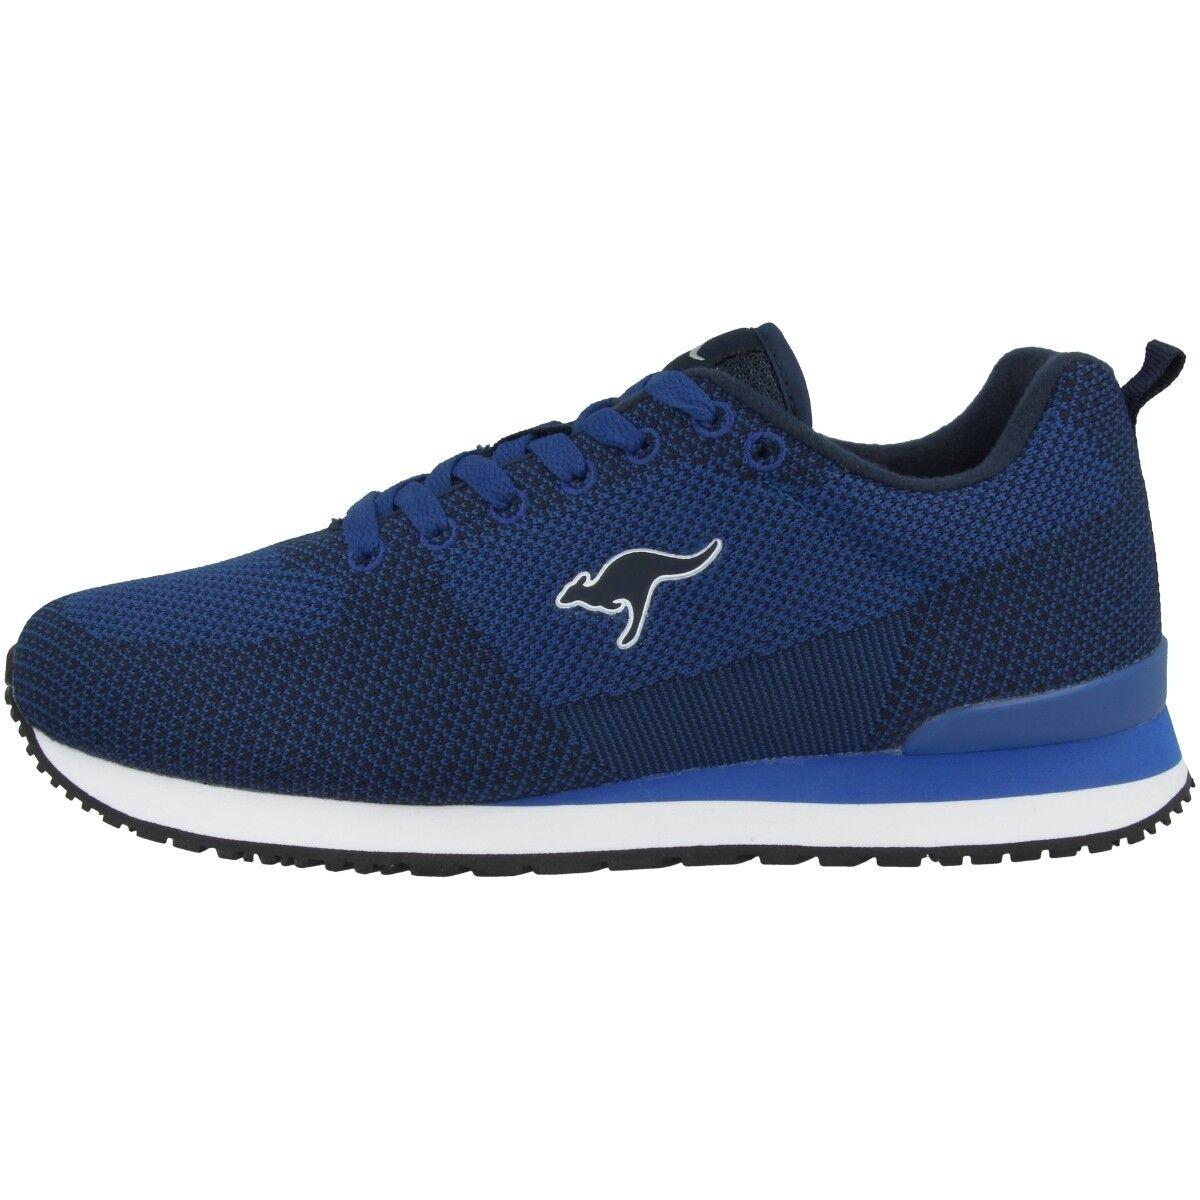 Kangaroos Retro Racer in Tessuto shoes da Ginnastica Sneakers blue Marino